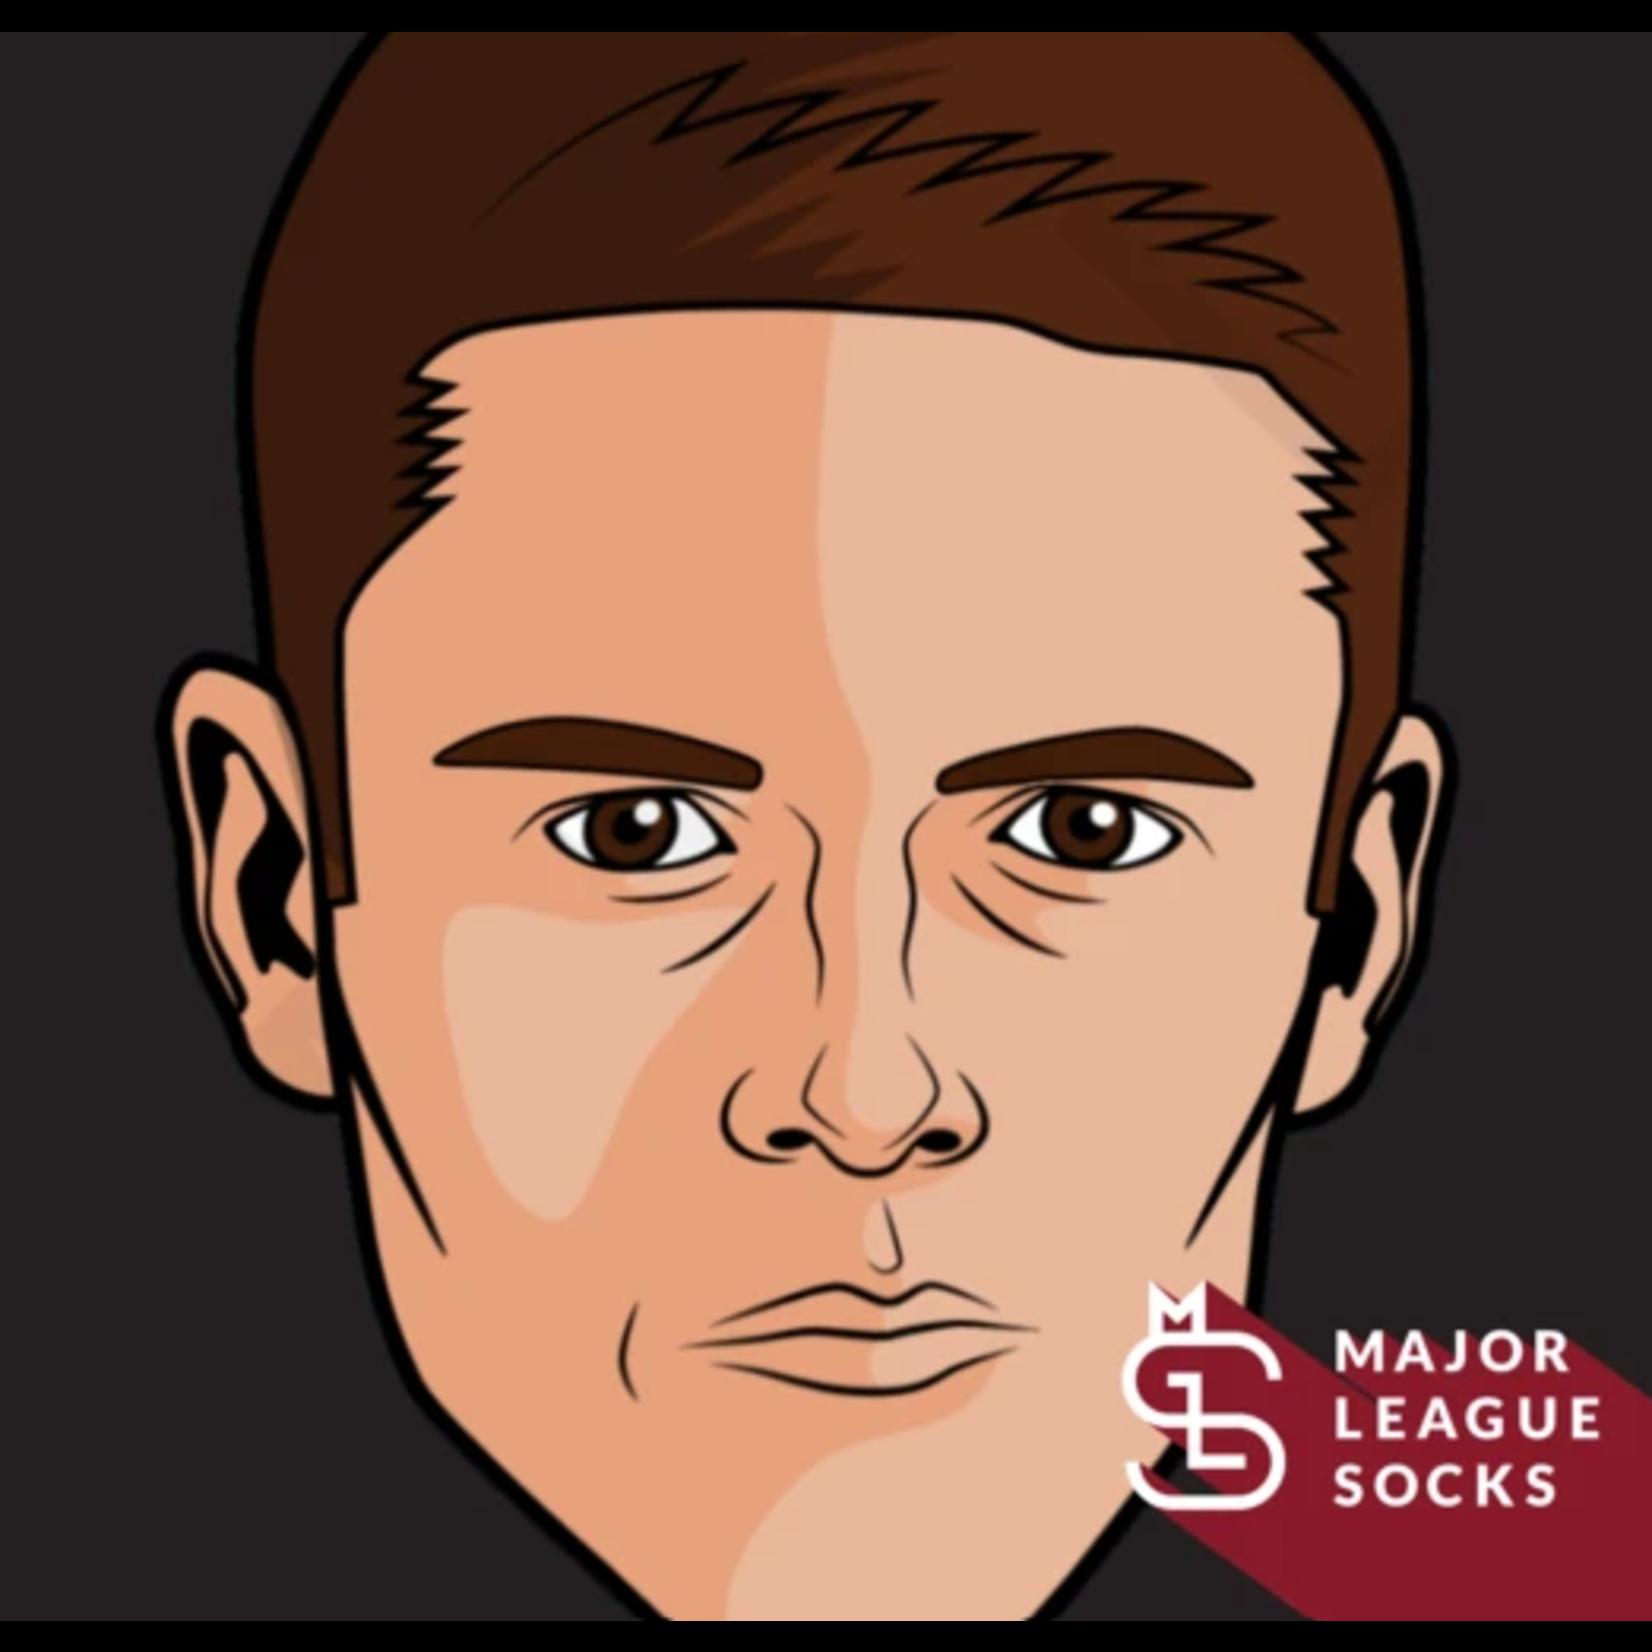 Major League Socks- Jonathan Toews